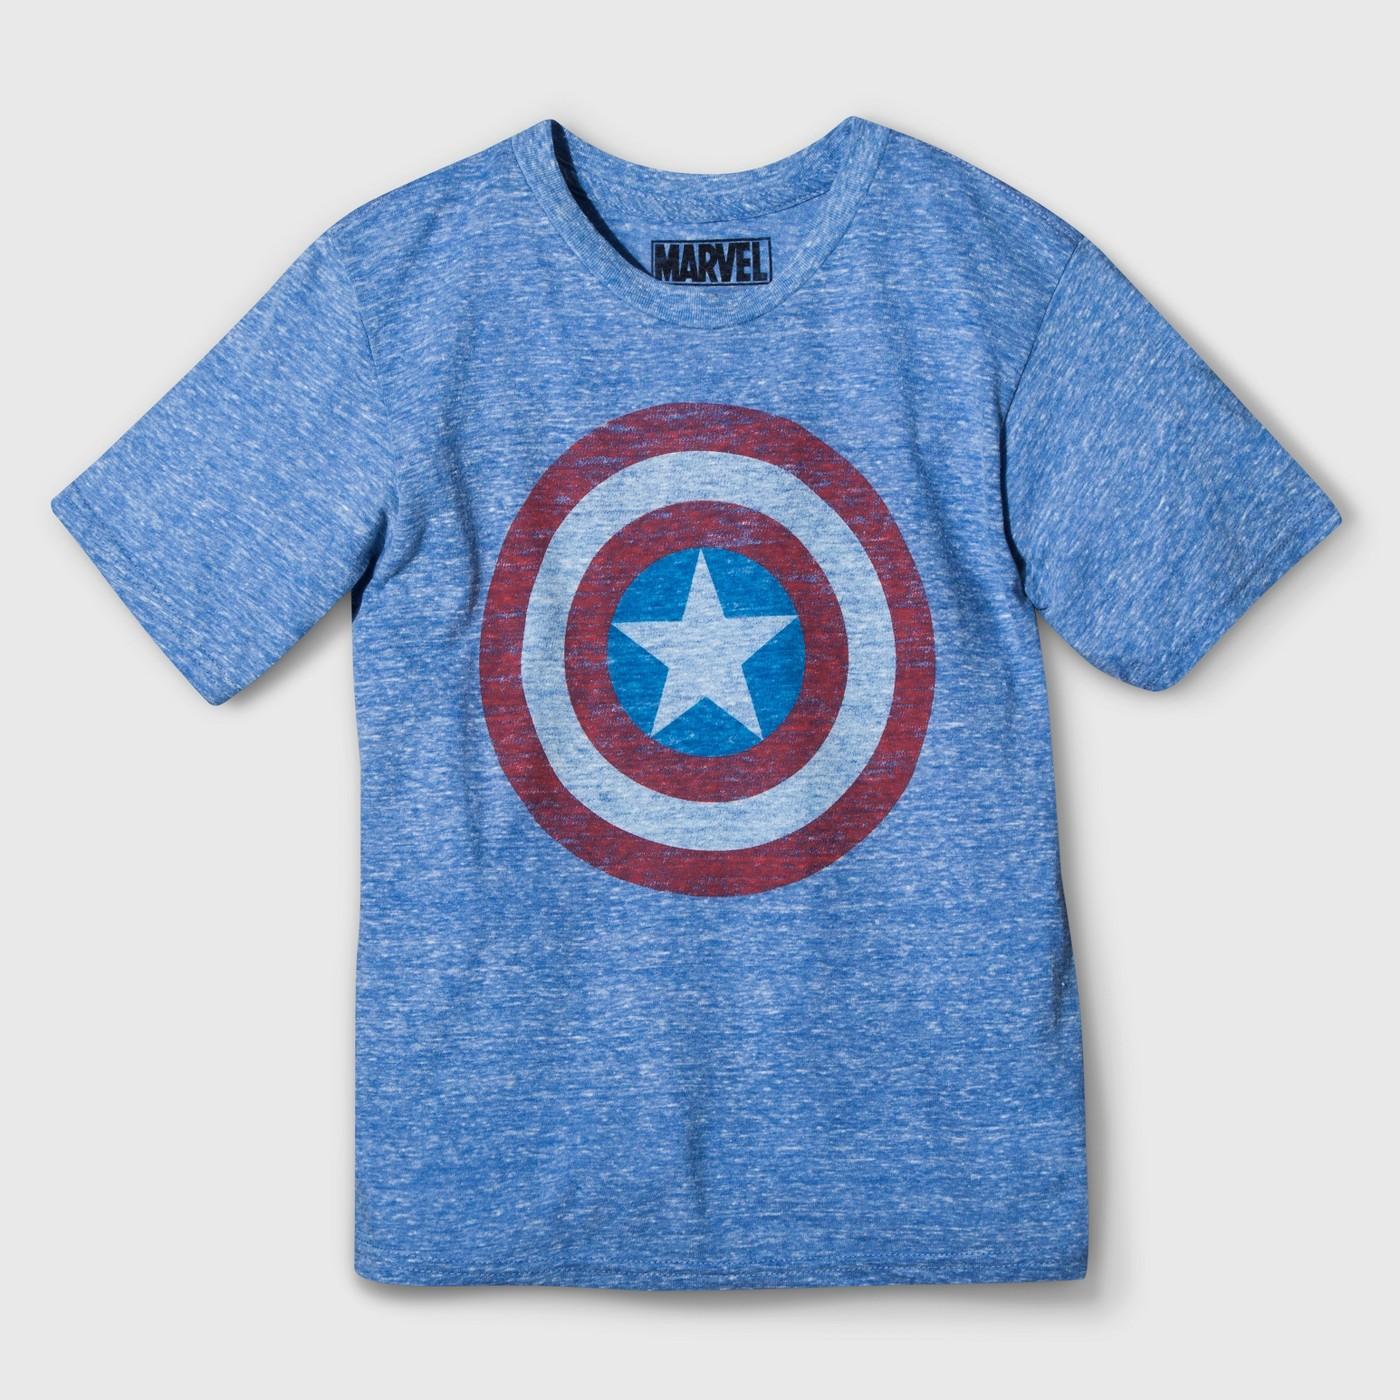 2d88f923880f1 Rad Superhero Shirts To Make Your Day Superhuman | Book Riot